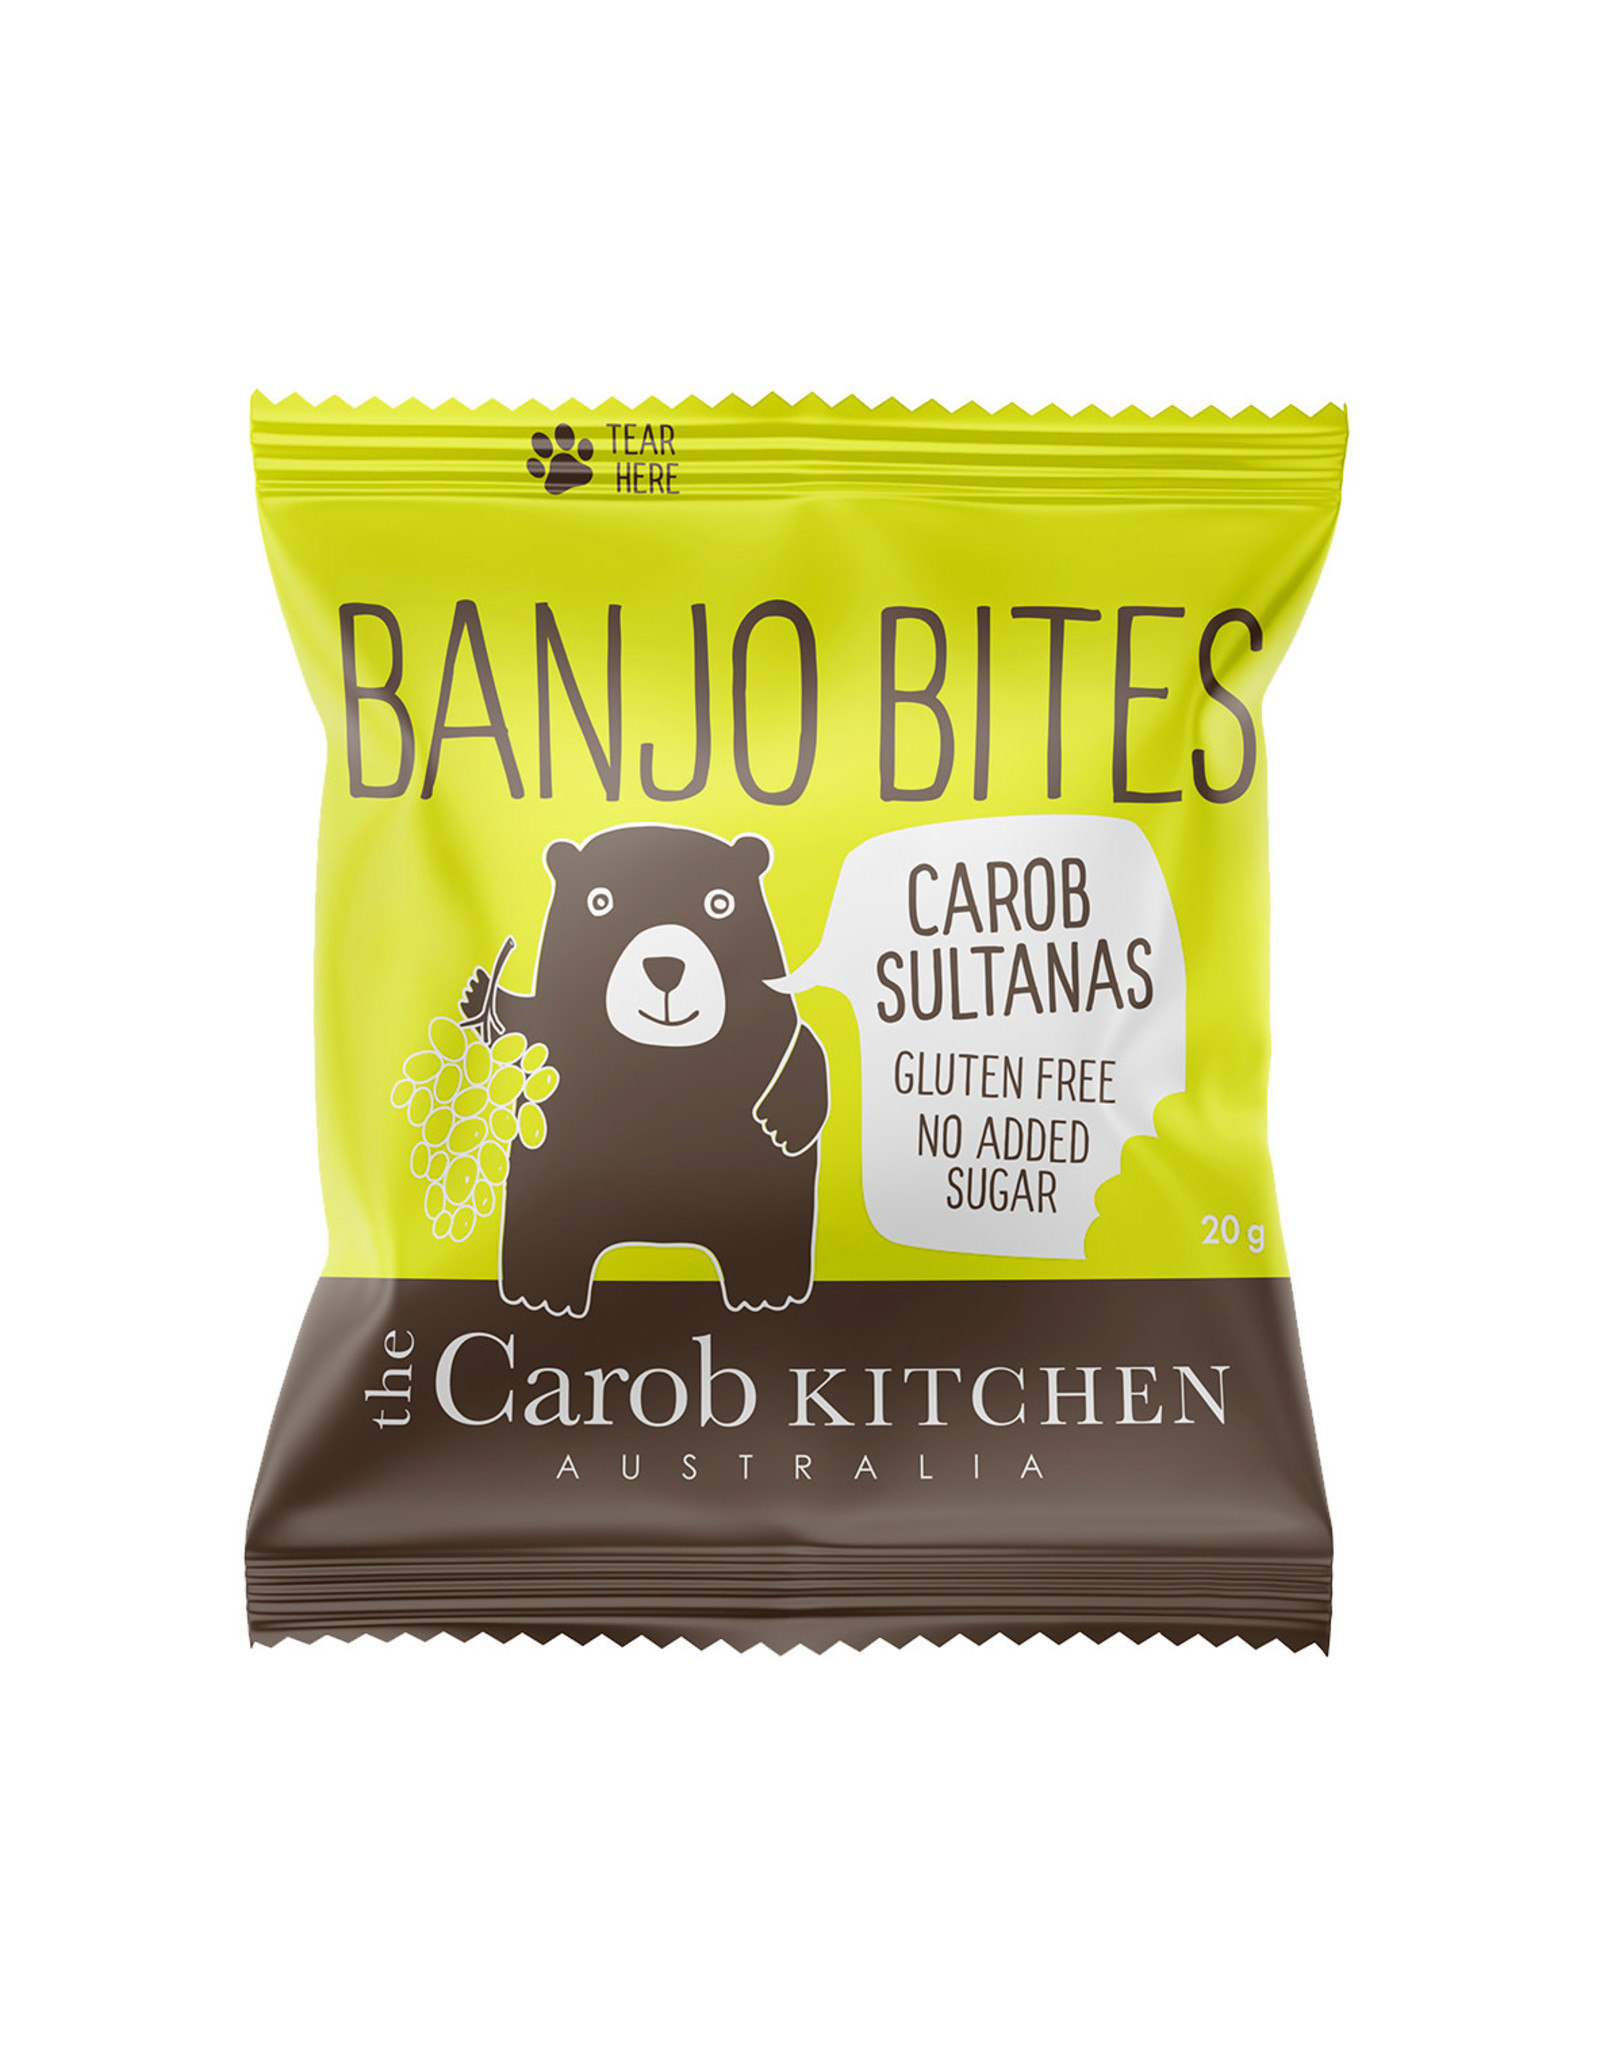 The Carob Kitchen Carob Sultanas Banjo Bits 20g